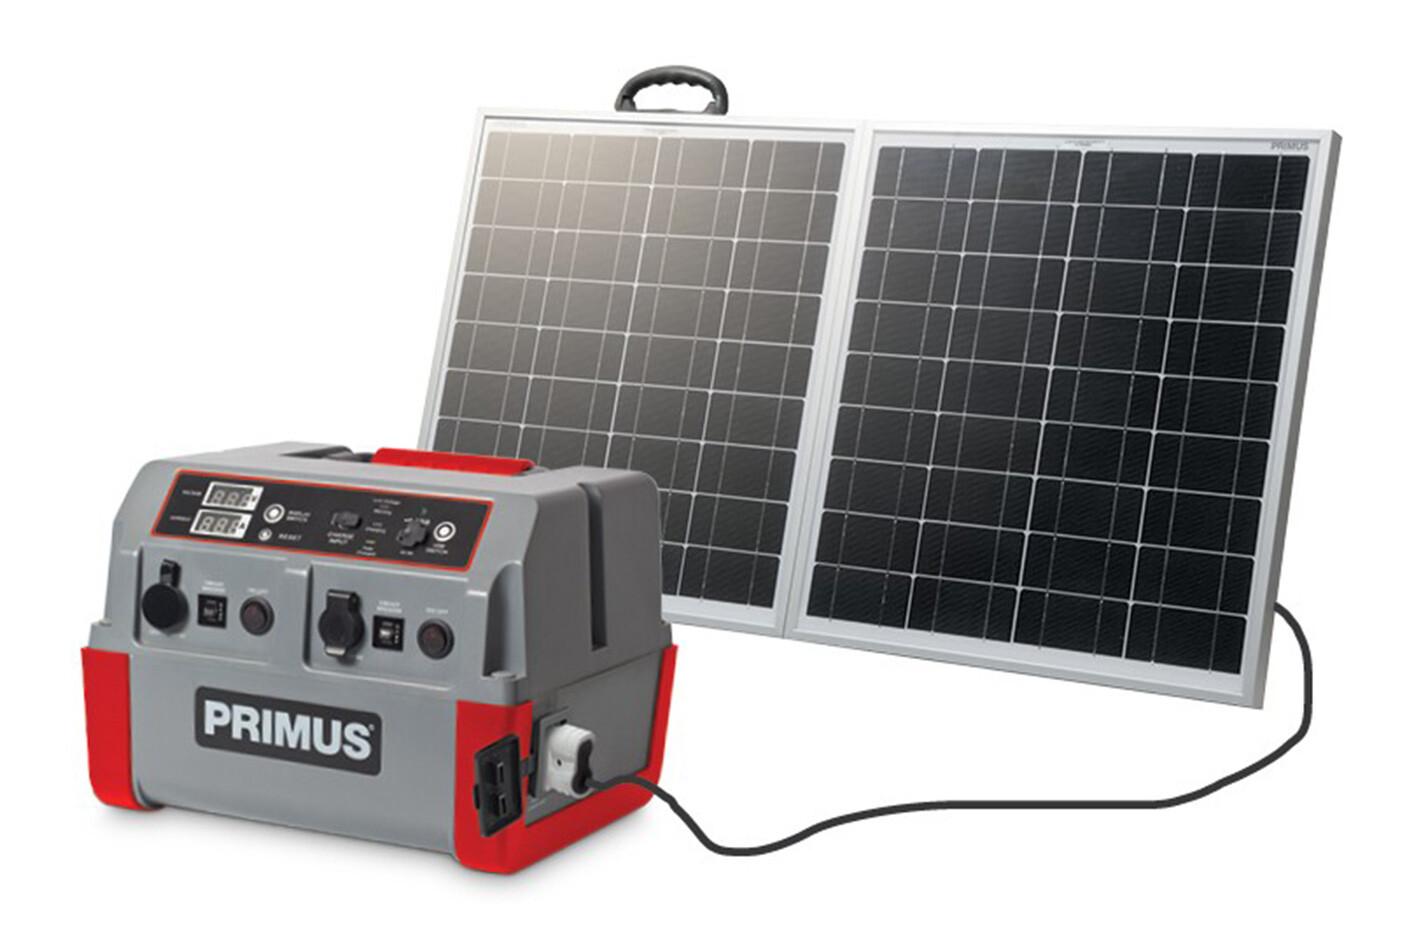 Primus-Portable-Power-Pack-44Ah-solar-panel.jpg